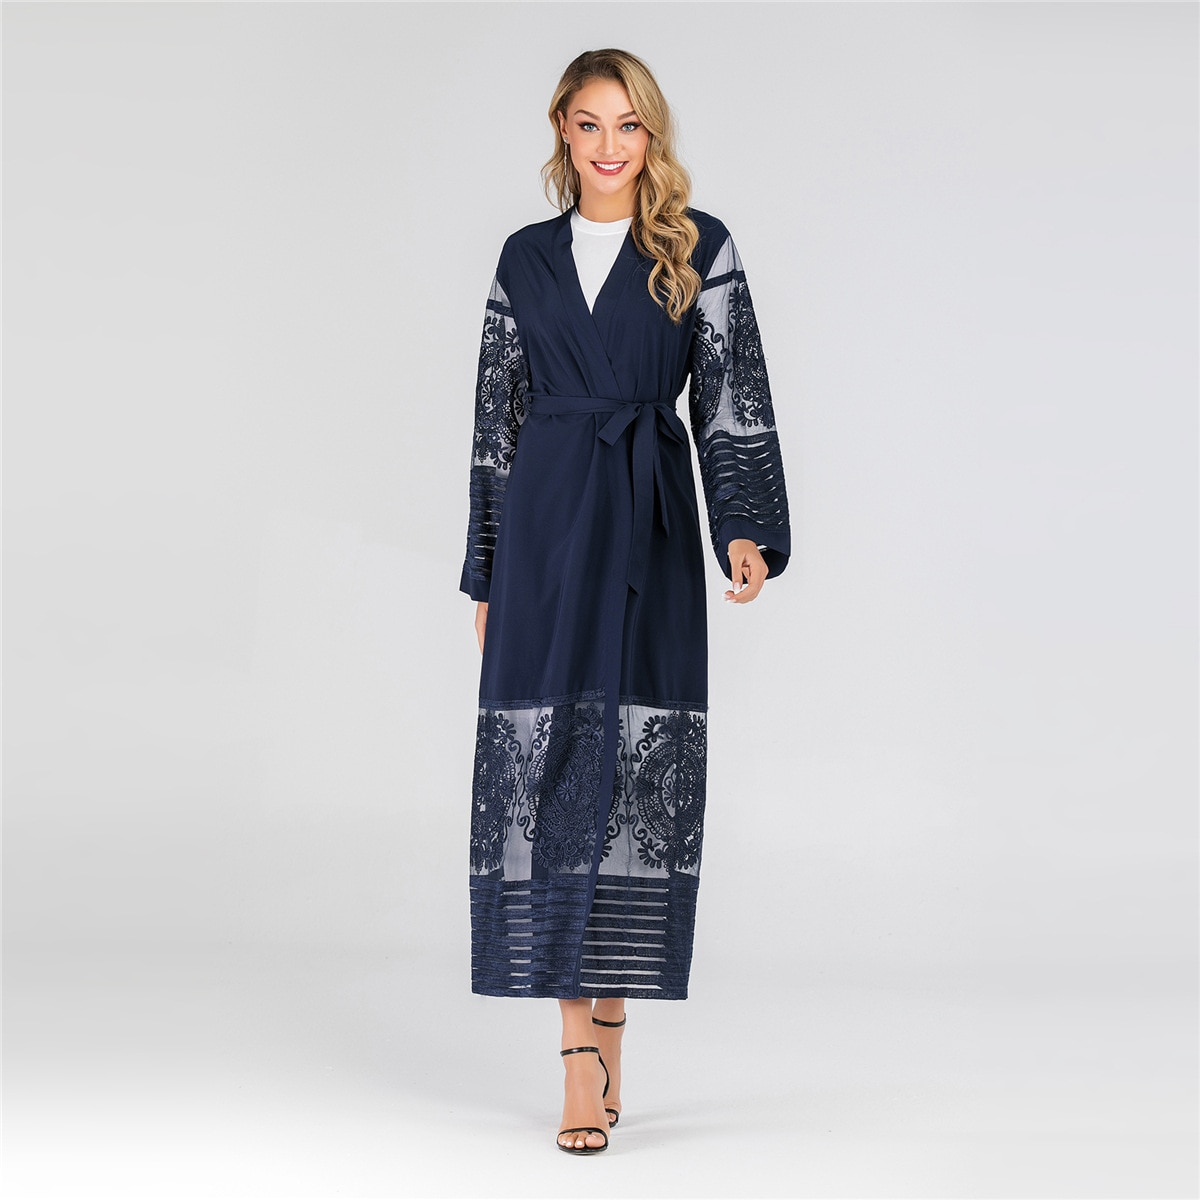 Cardigan largo musulmán bata de mujer ropa de abrigo de malla bordada elegante gabardina para mujeres de manga larga Tops A1546